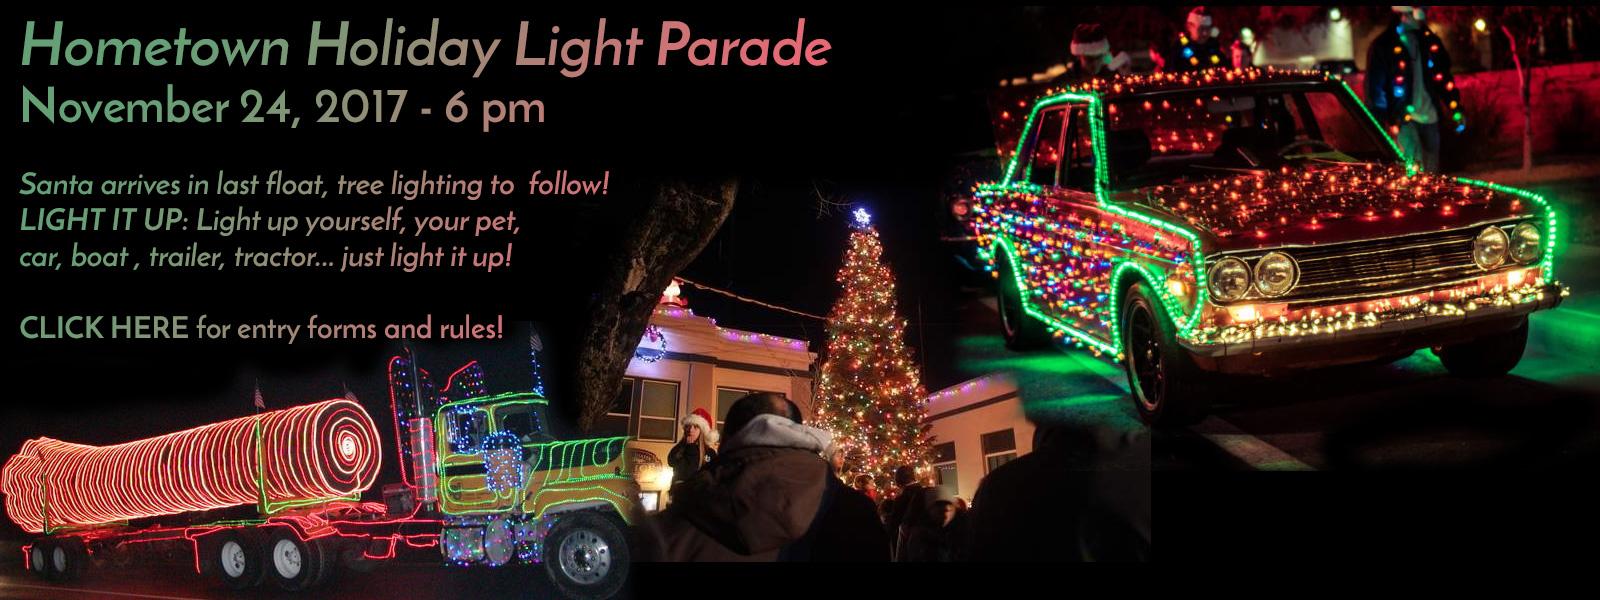 Hometown Holiday Light Parade 2017